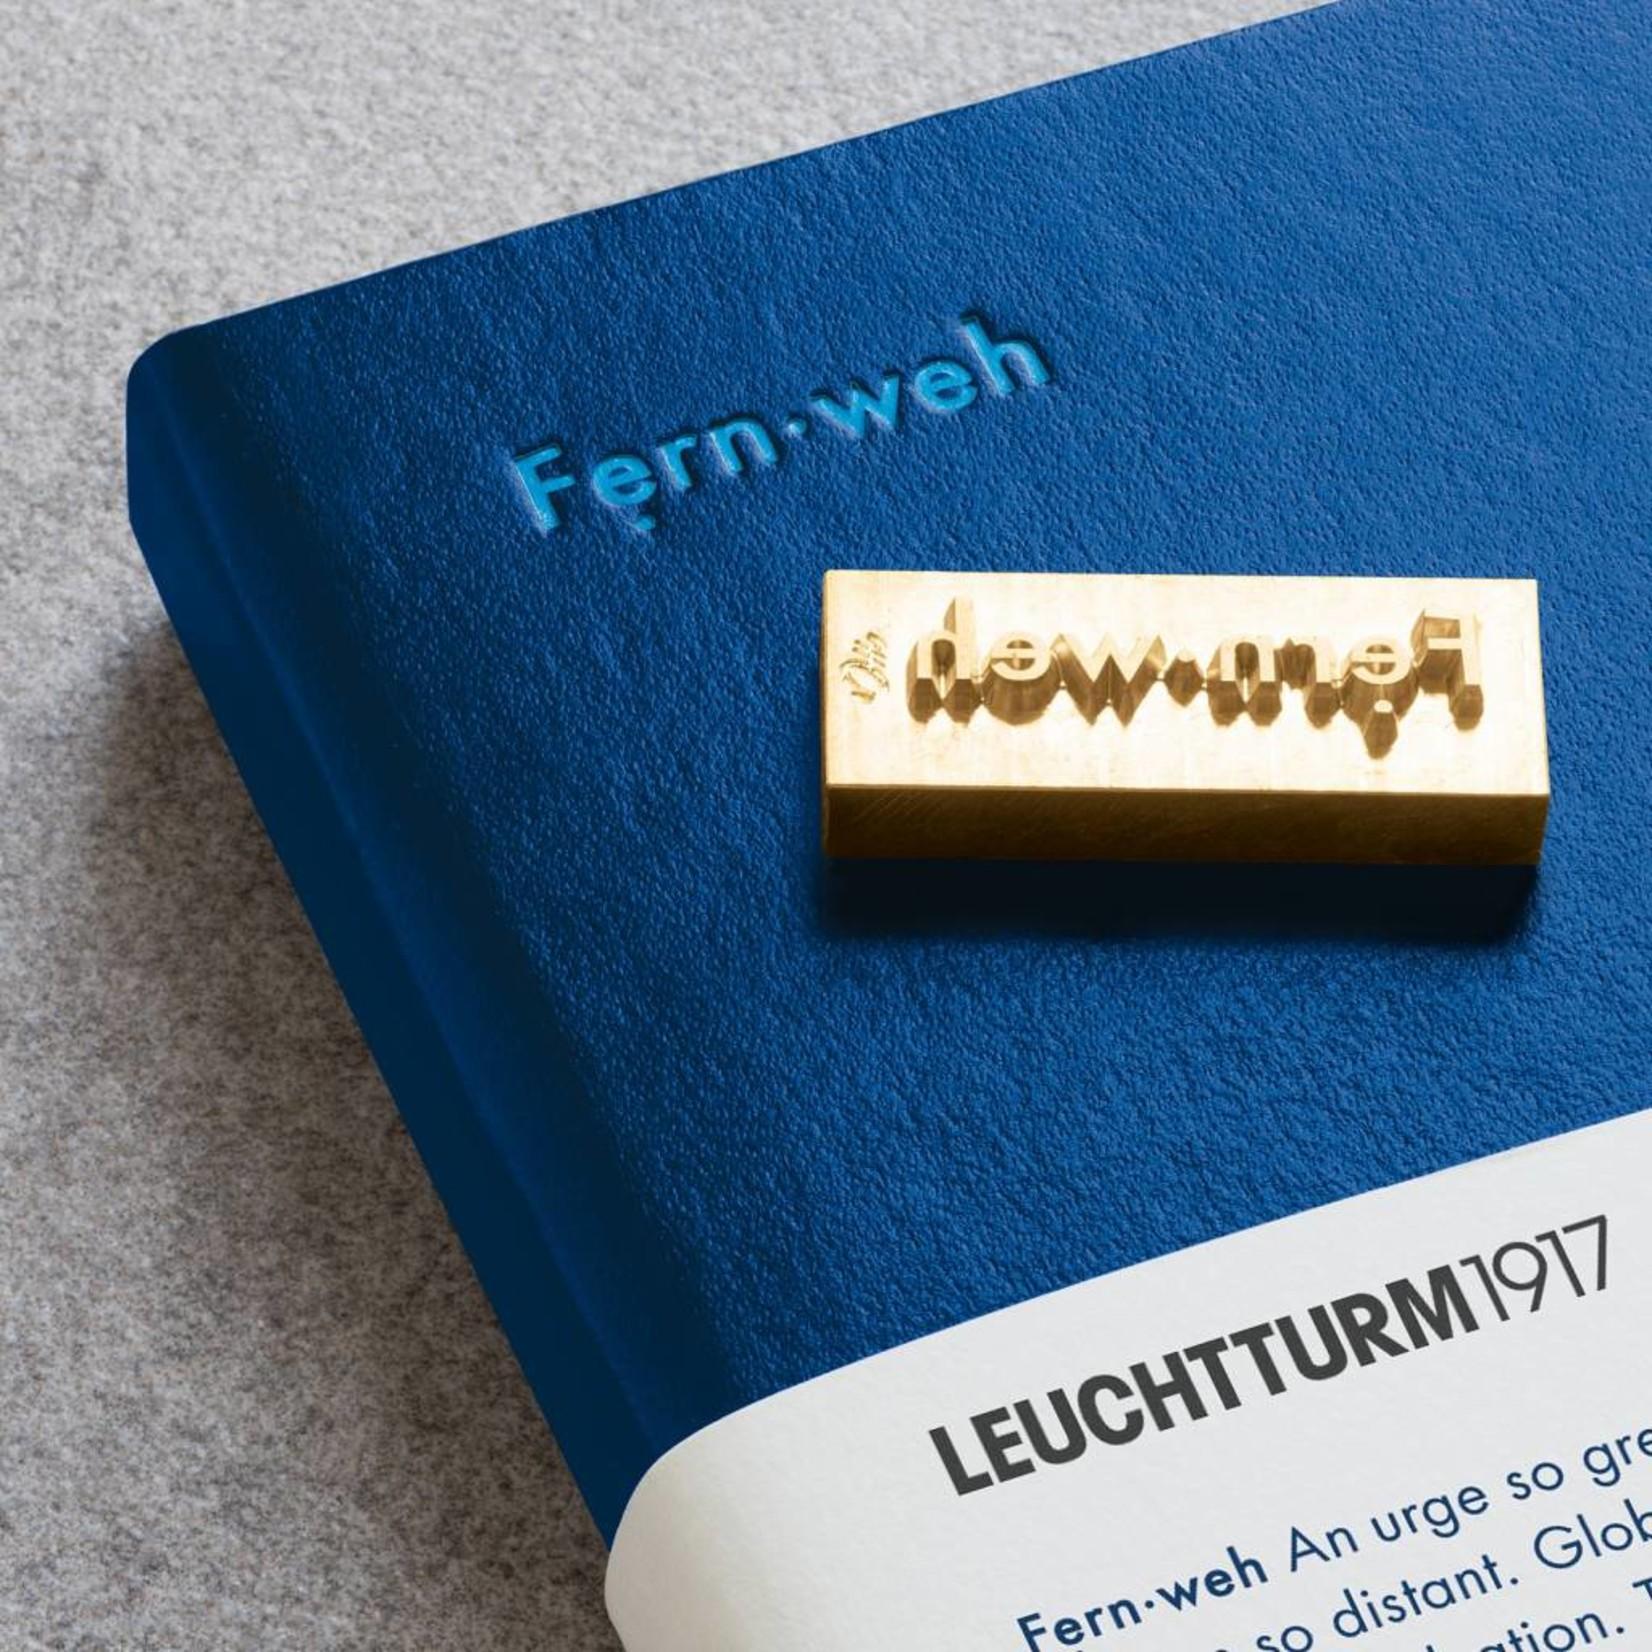 Leuchtturm1917 LT NB MEDIUM Leuchtkraft Azur-Sehnsucht dotted